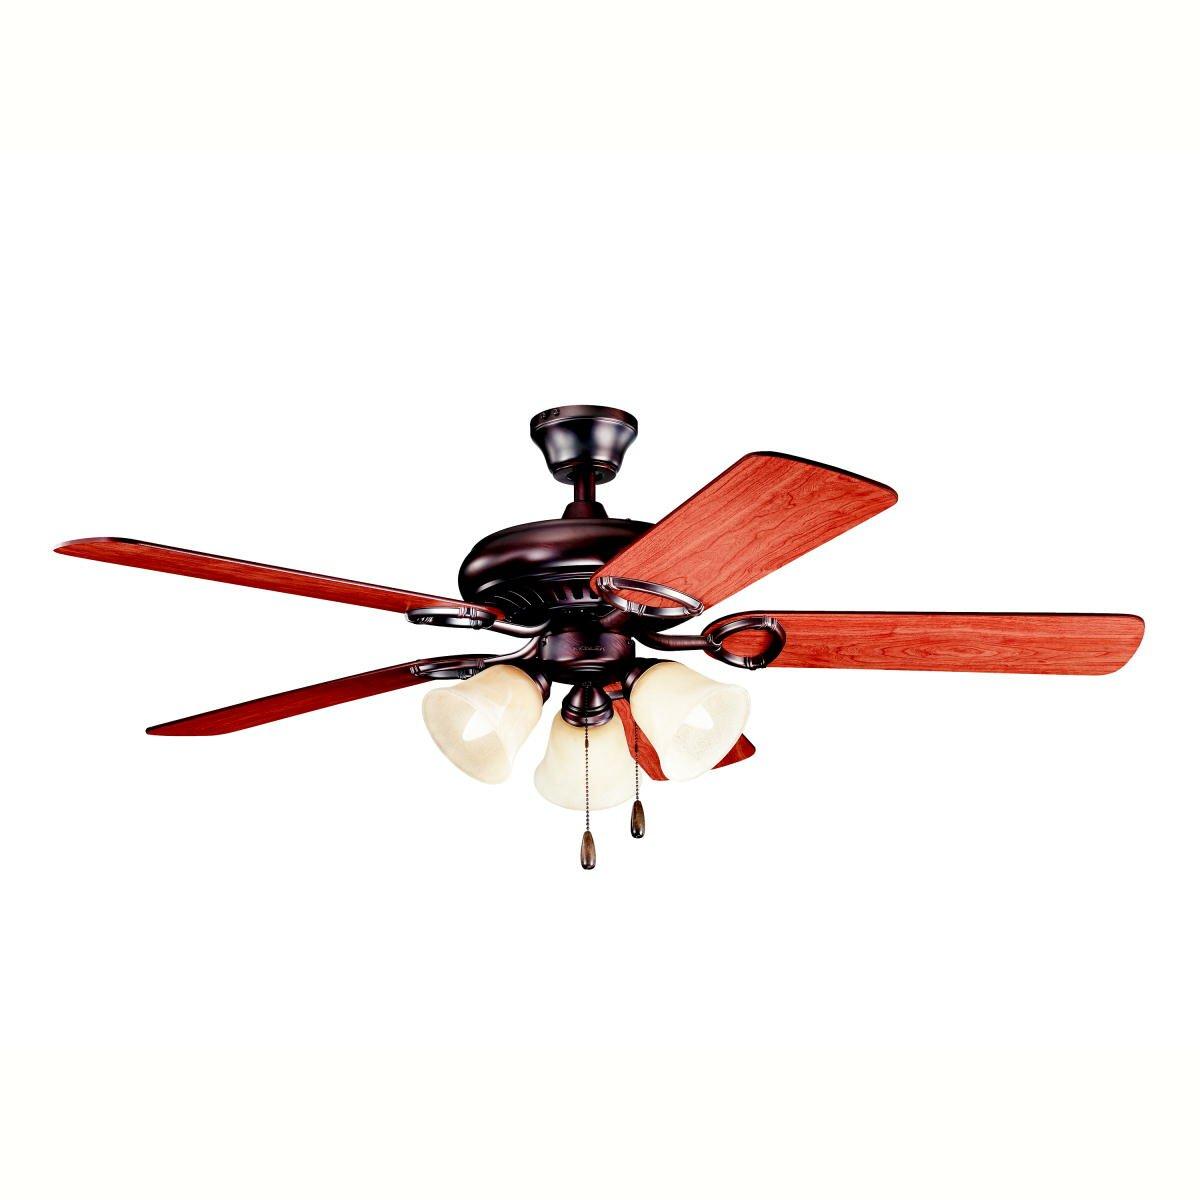 "Kichler 52"" Sutter Place Premier 5 Blade Ceiling Fan"